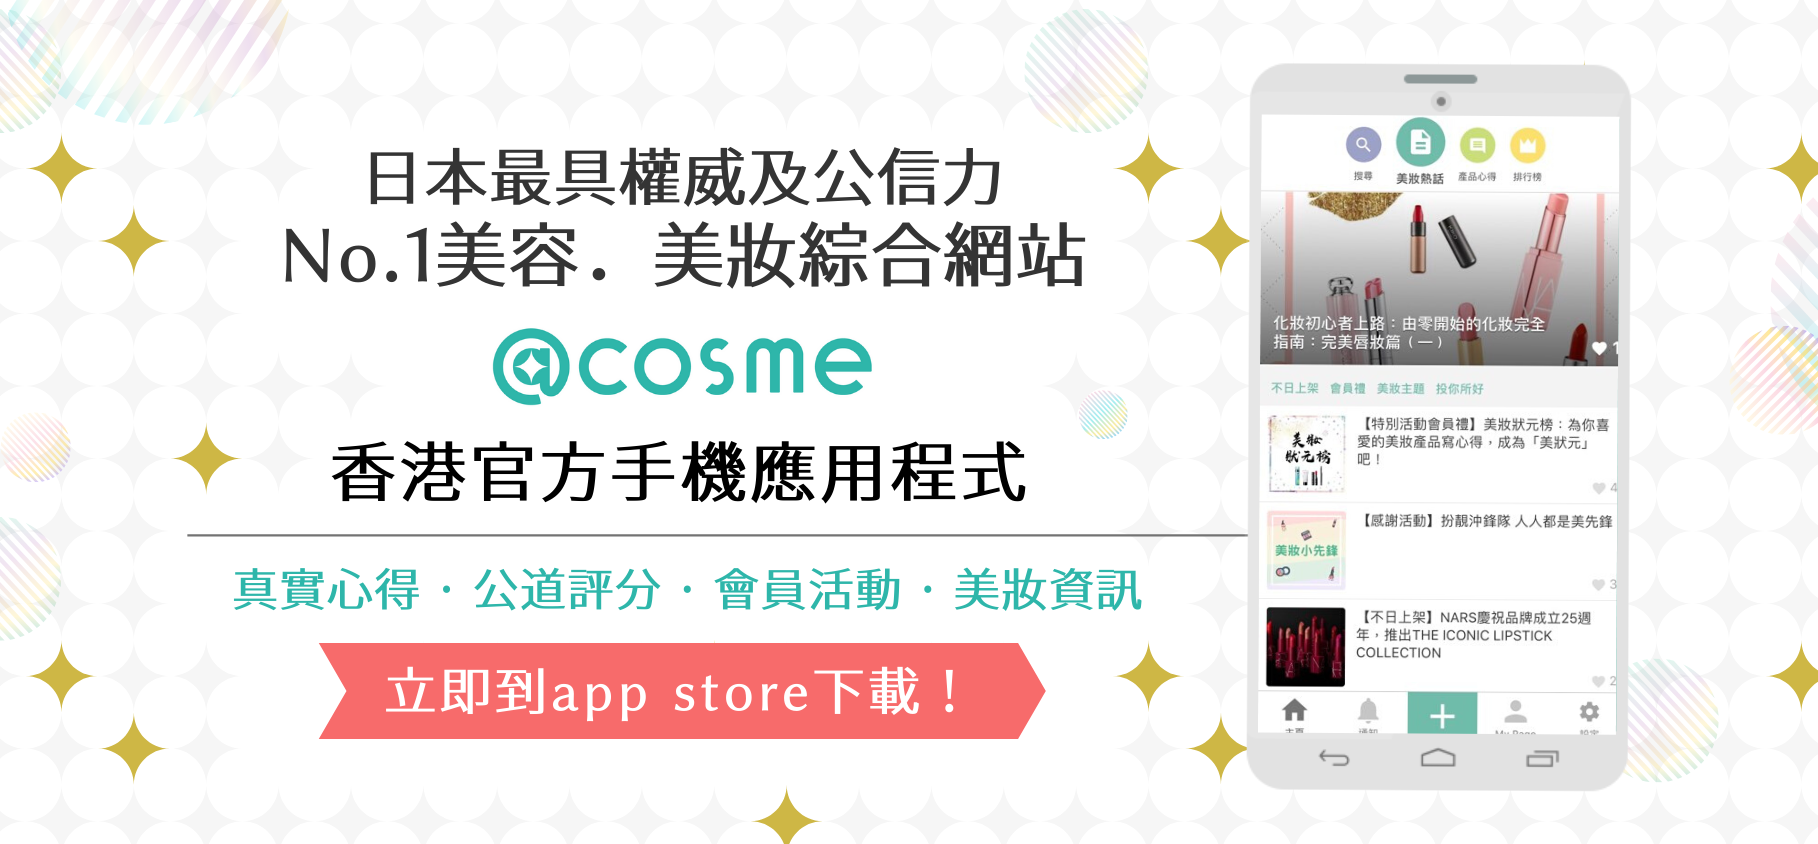 @cosme app